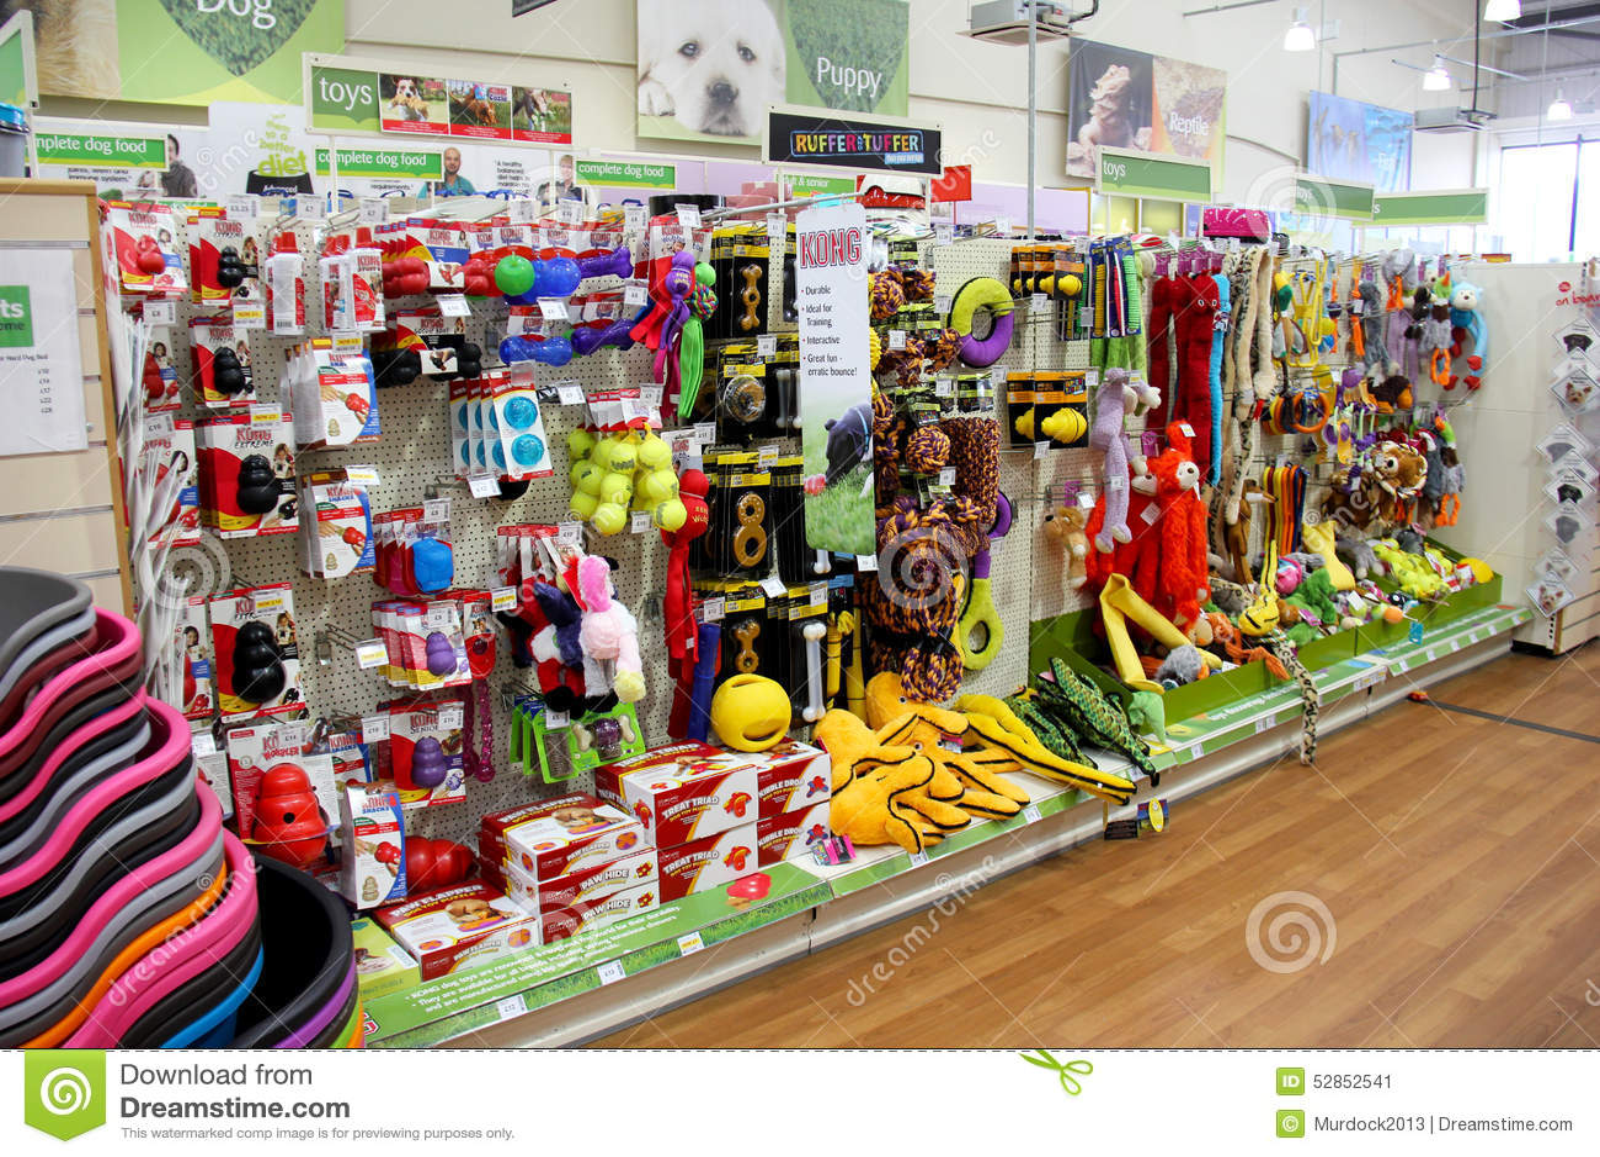 Petsmart Dog Toy Sale